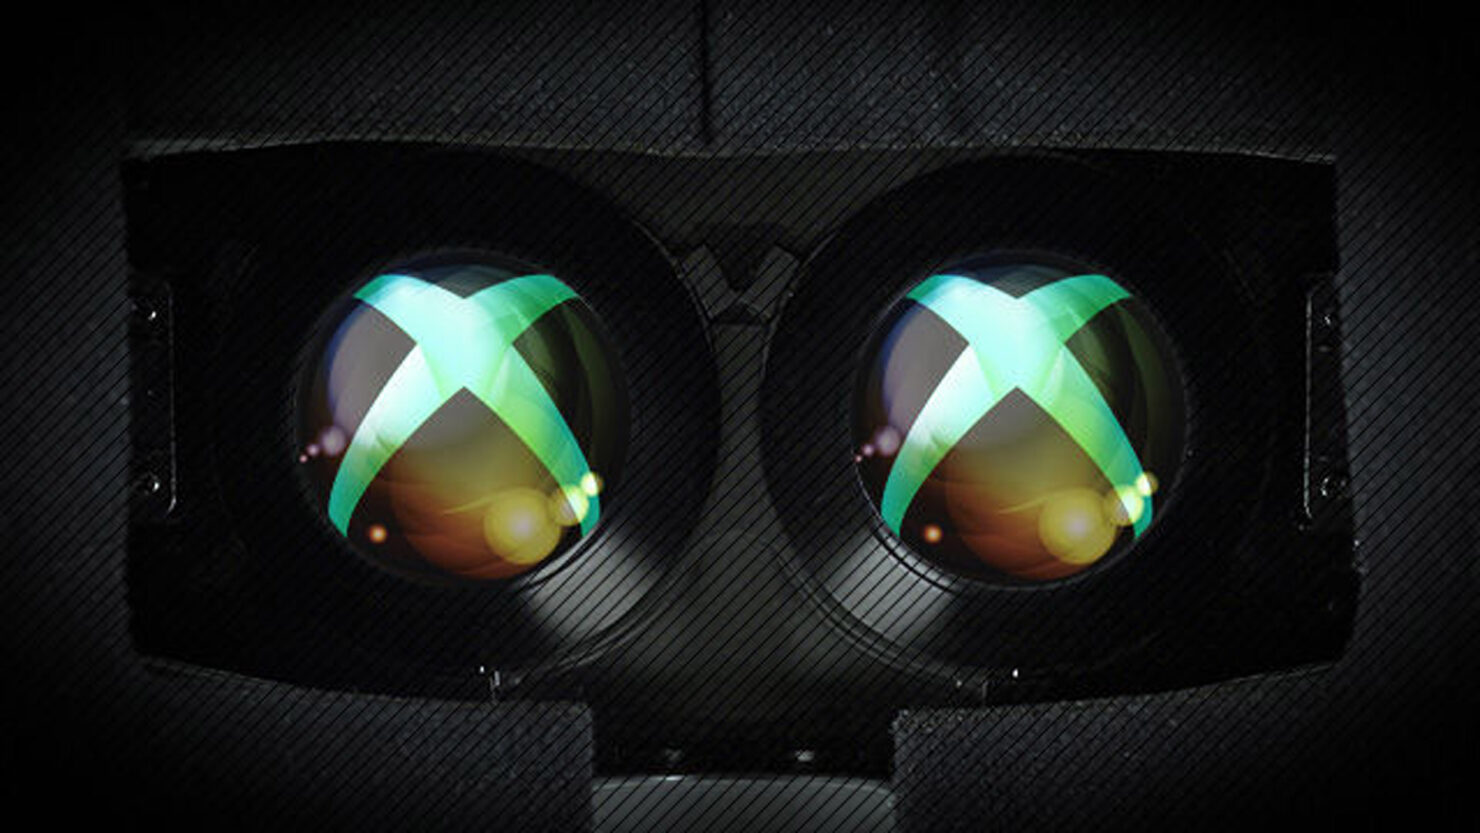 xbox vr mr xbox one x